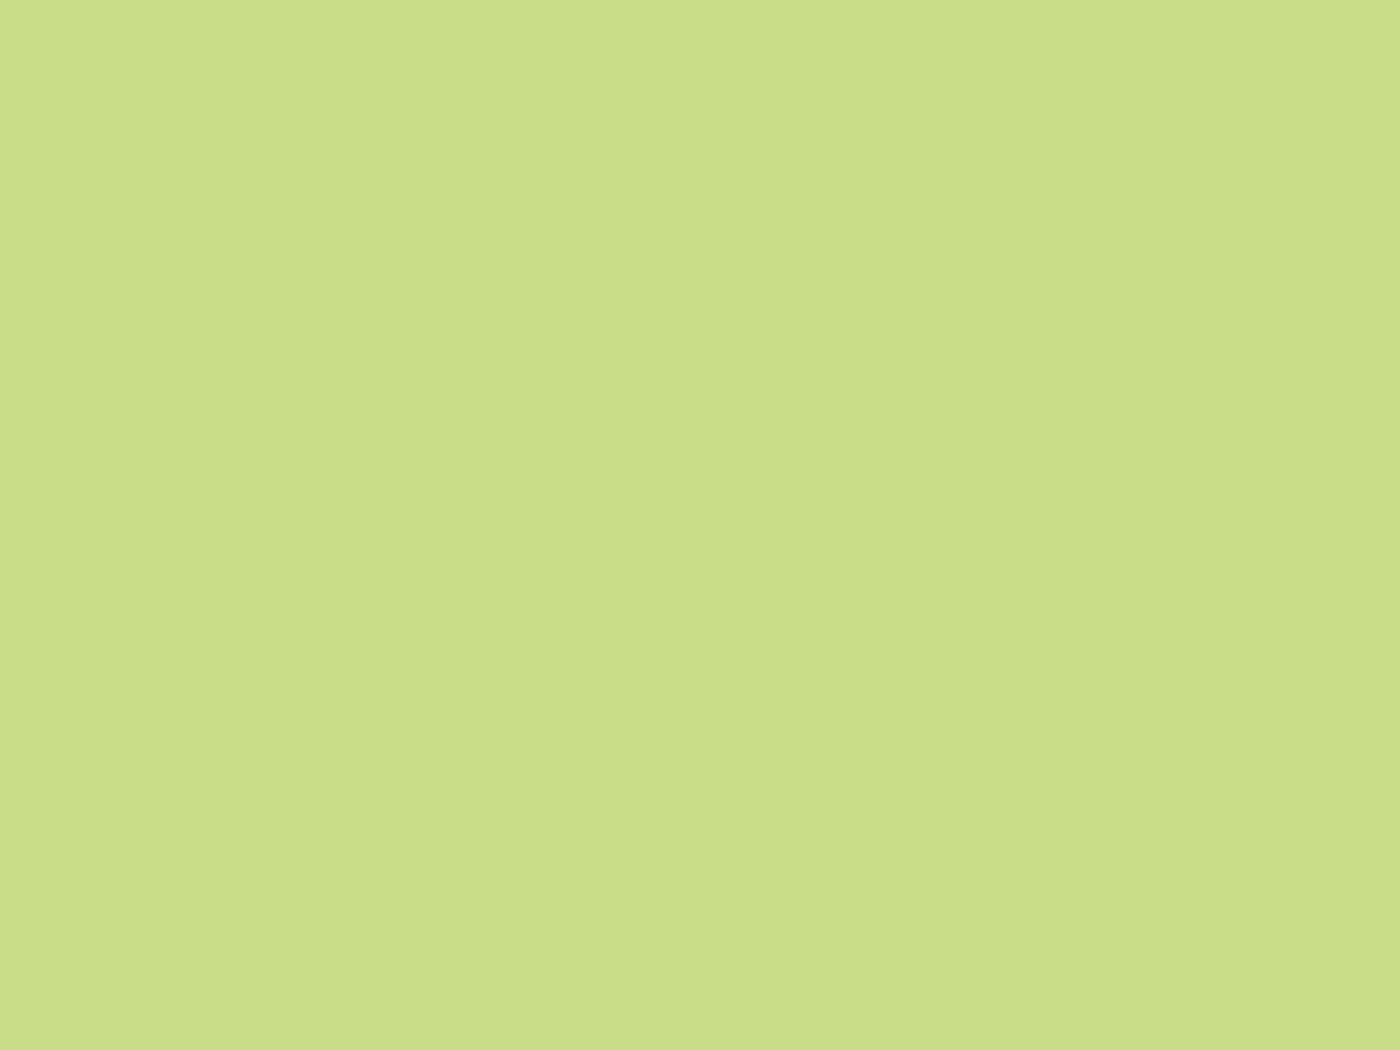 1400x1050 Medium Spring Bud Solid Color Background